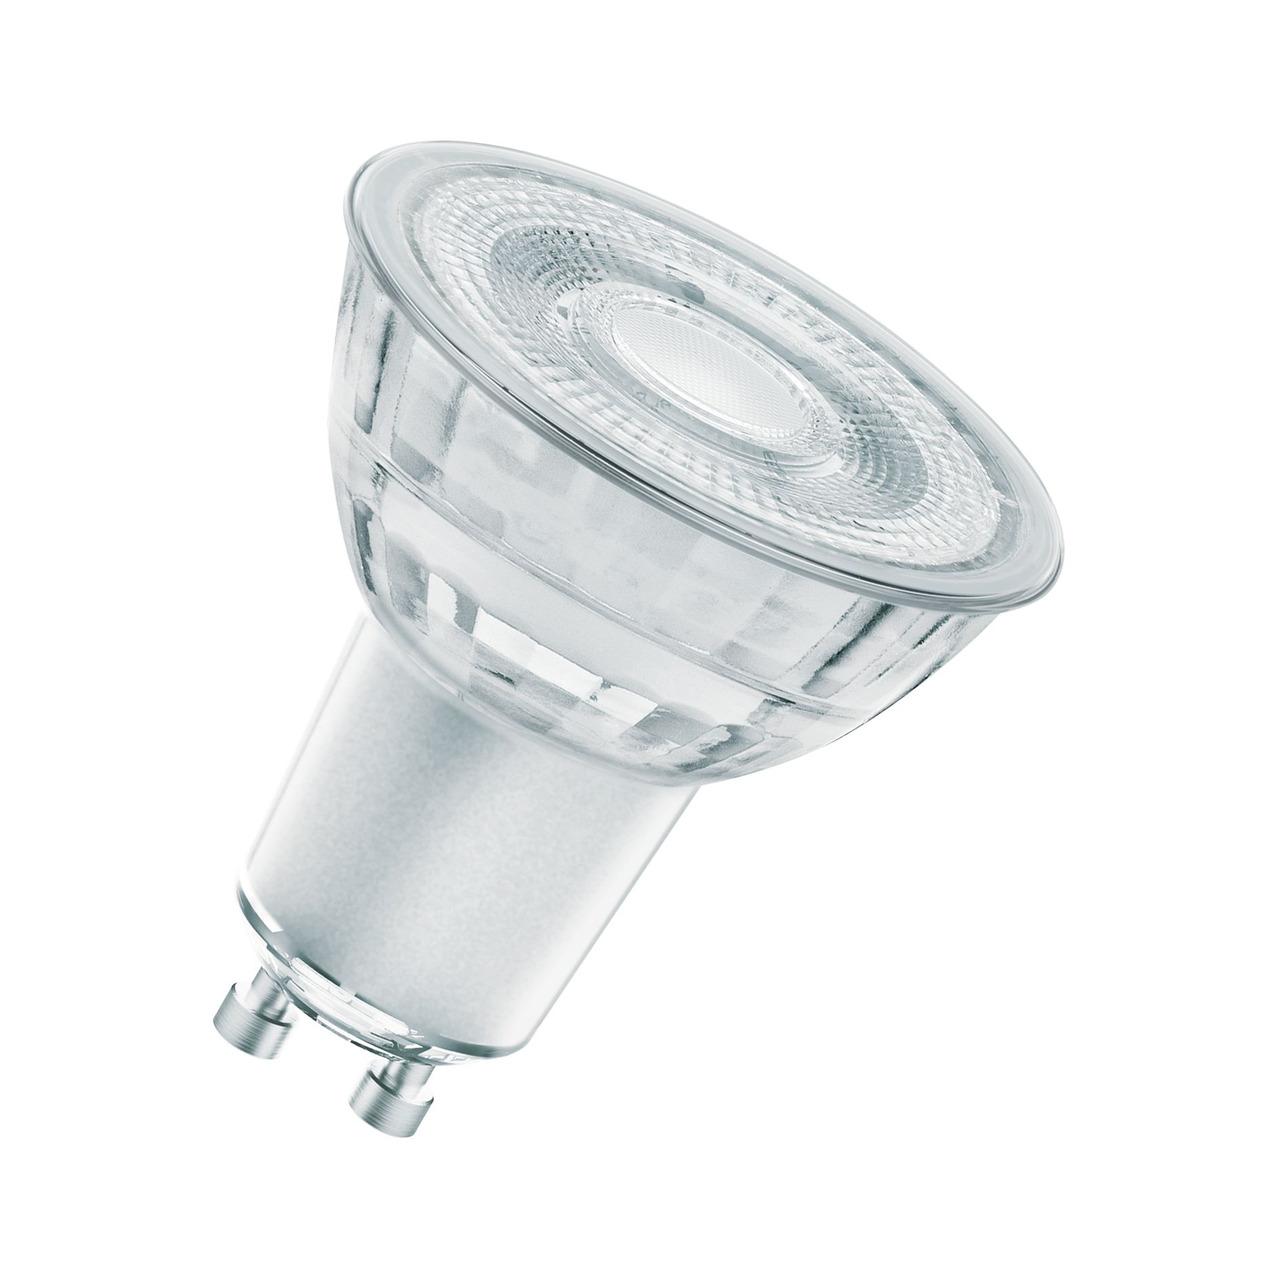 OSRAM LED STAR Plus 4-5-W-GU10-LED-Lampe 36- warmweiss- dimmbar (GLOWdim)